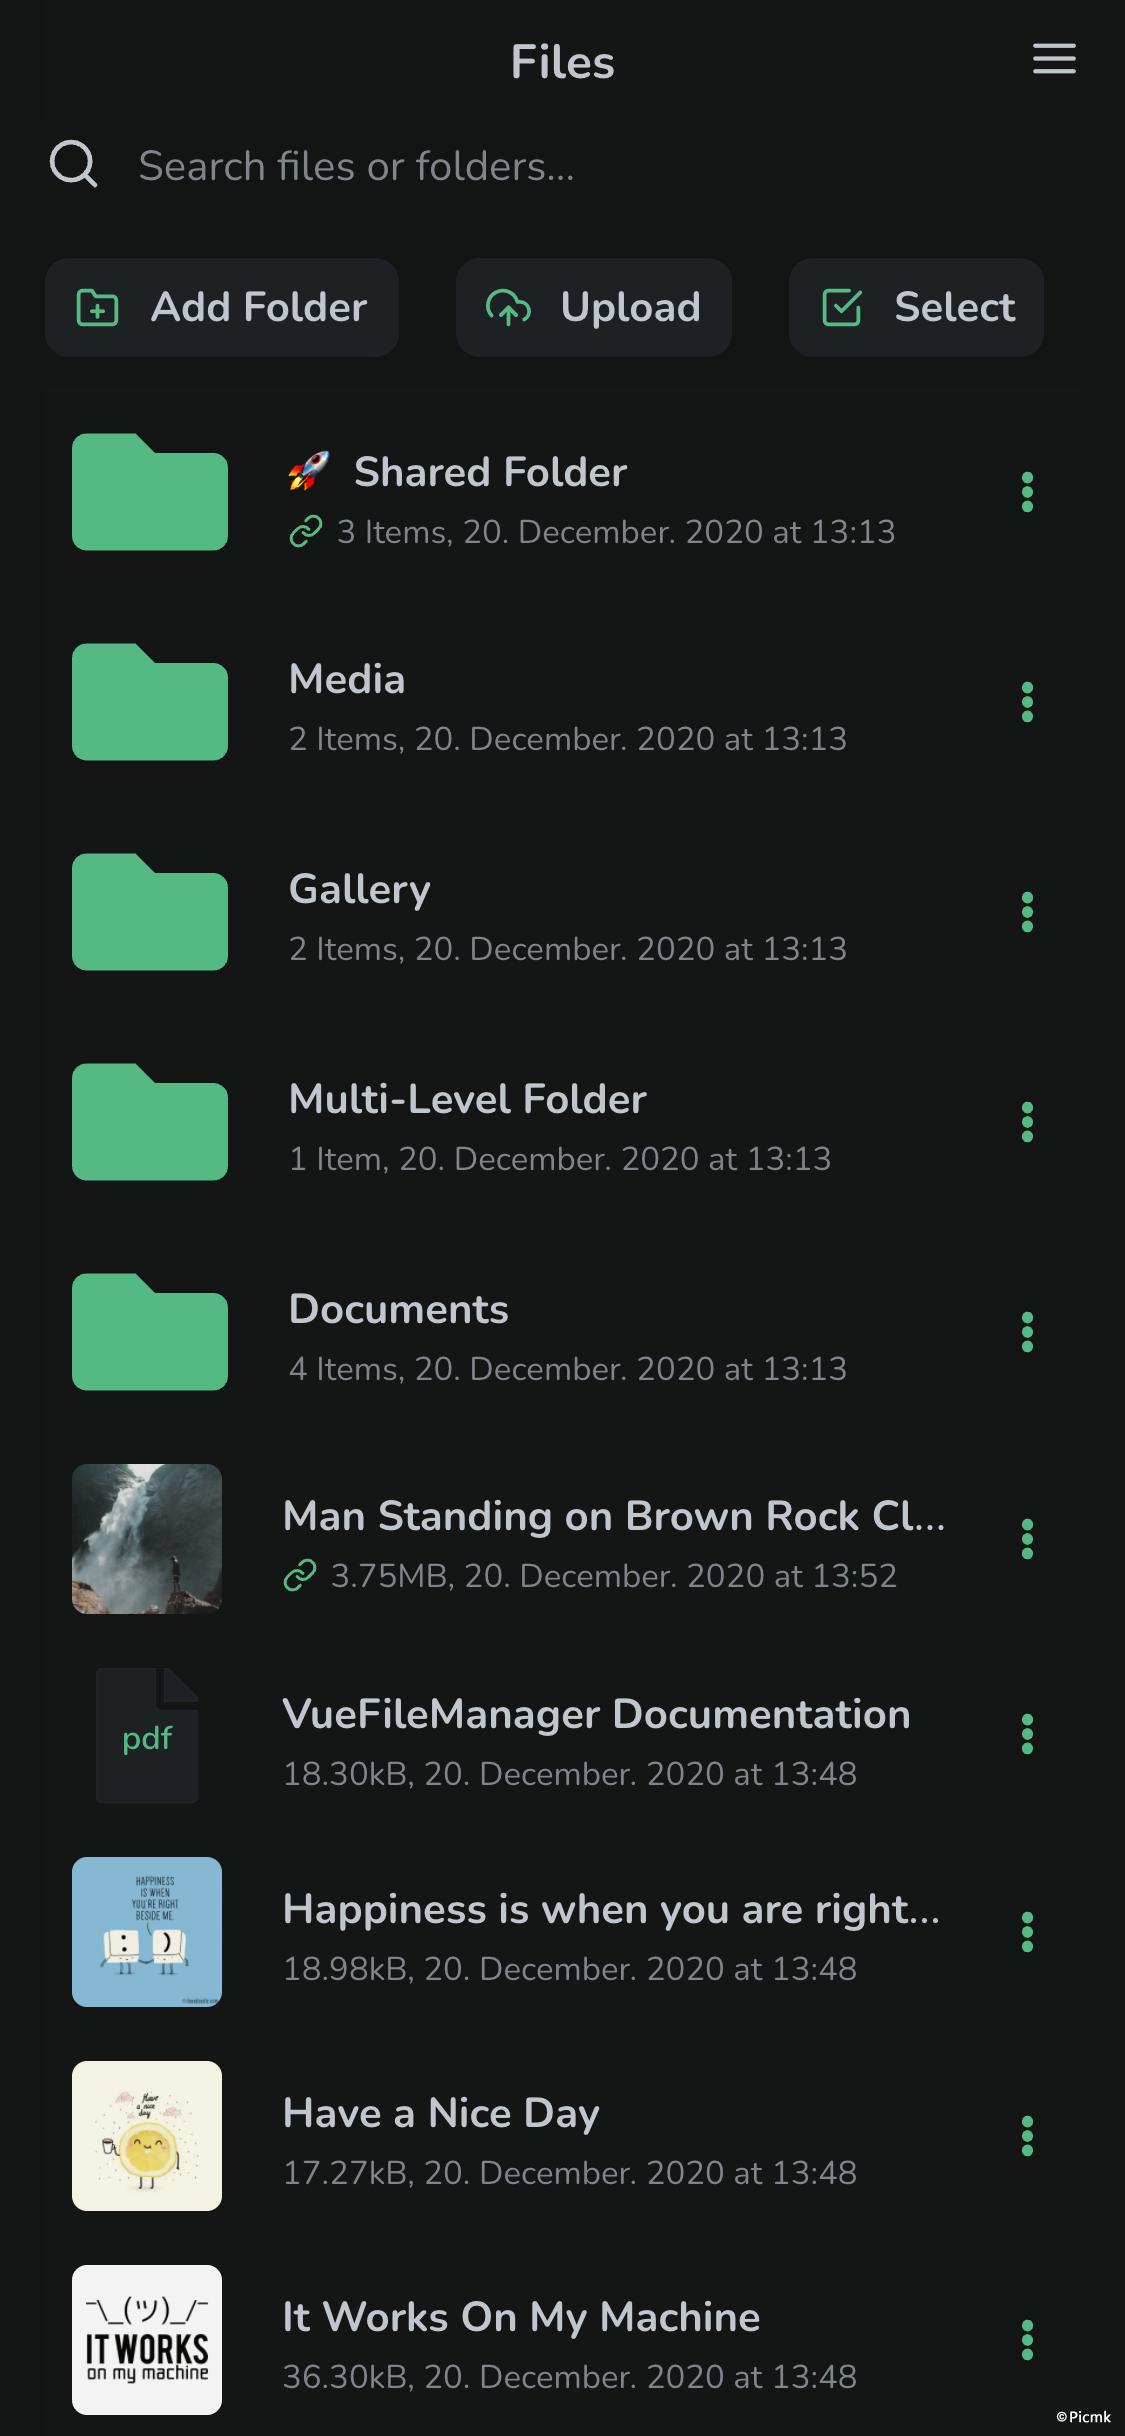 Vue文件管理器-基於Vue和Laravel的PHP商業版網絡硬盤程序_PHP雲存儲源碼_多語言帶中文簡體語言插圖5